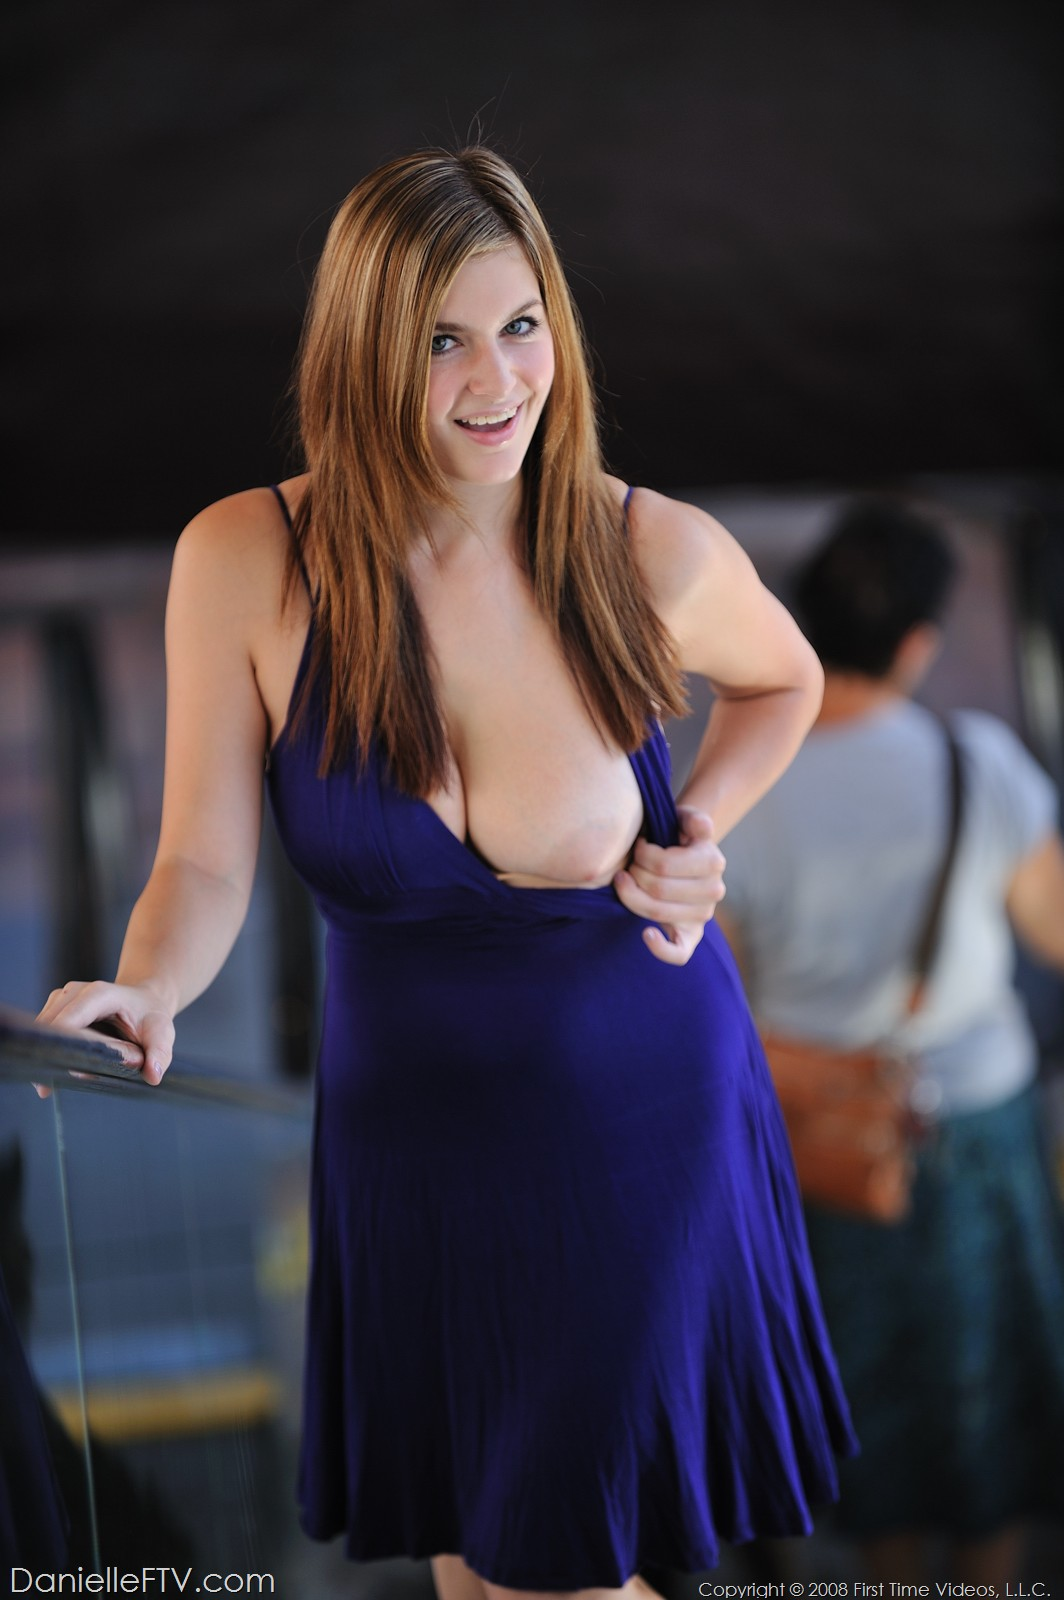 Big tits danielle ftv girls